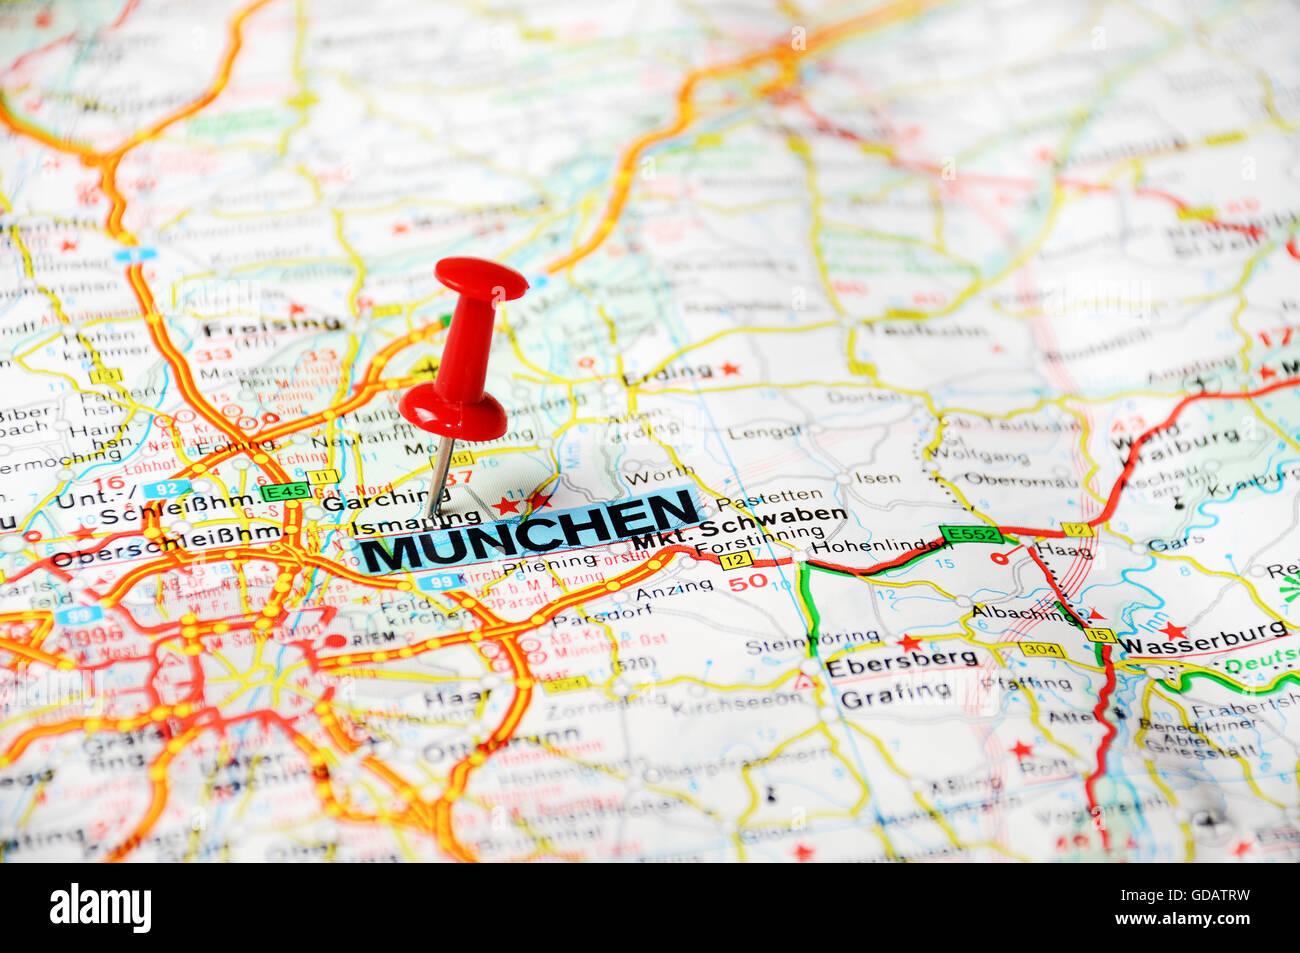 Cerca De Munich Alemania Mapa Con Clavija Roja Concepto De